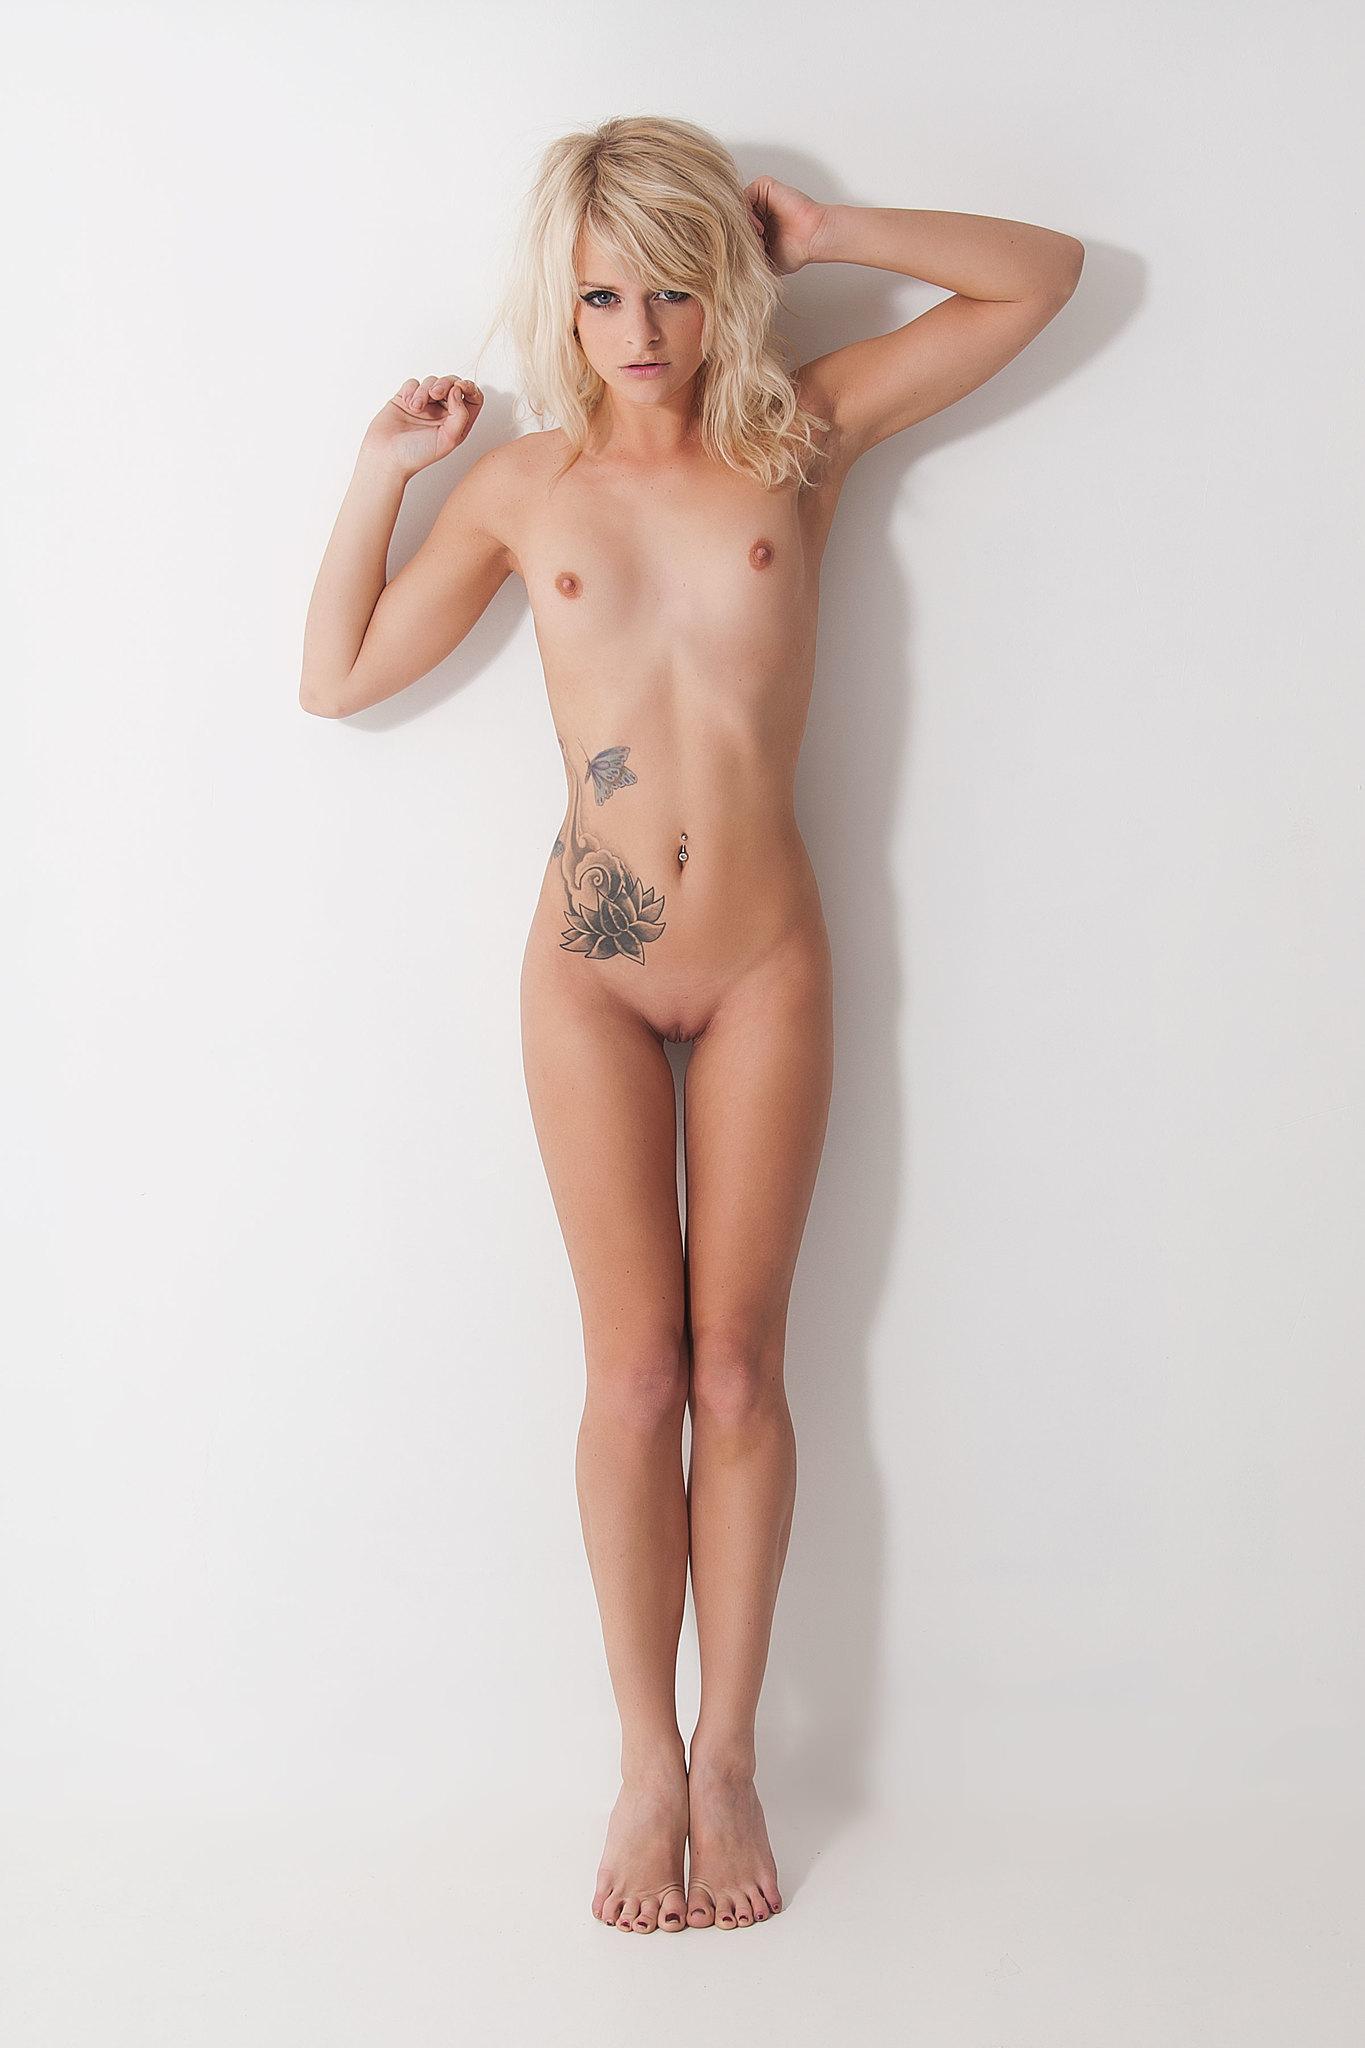 Worlds top 10 sexy nude women hentai girlfriends